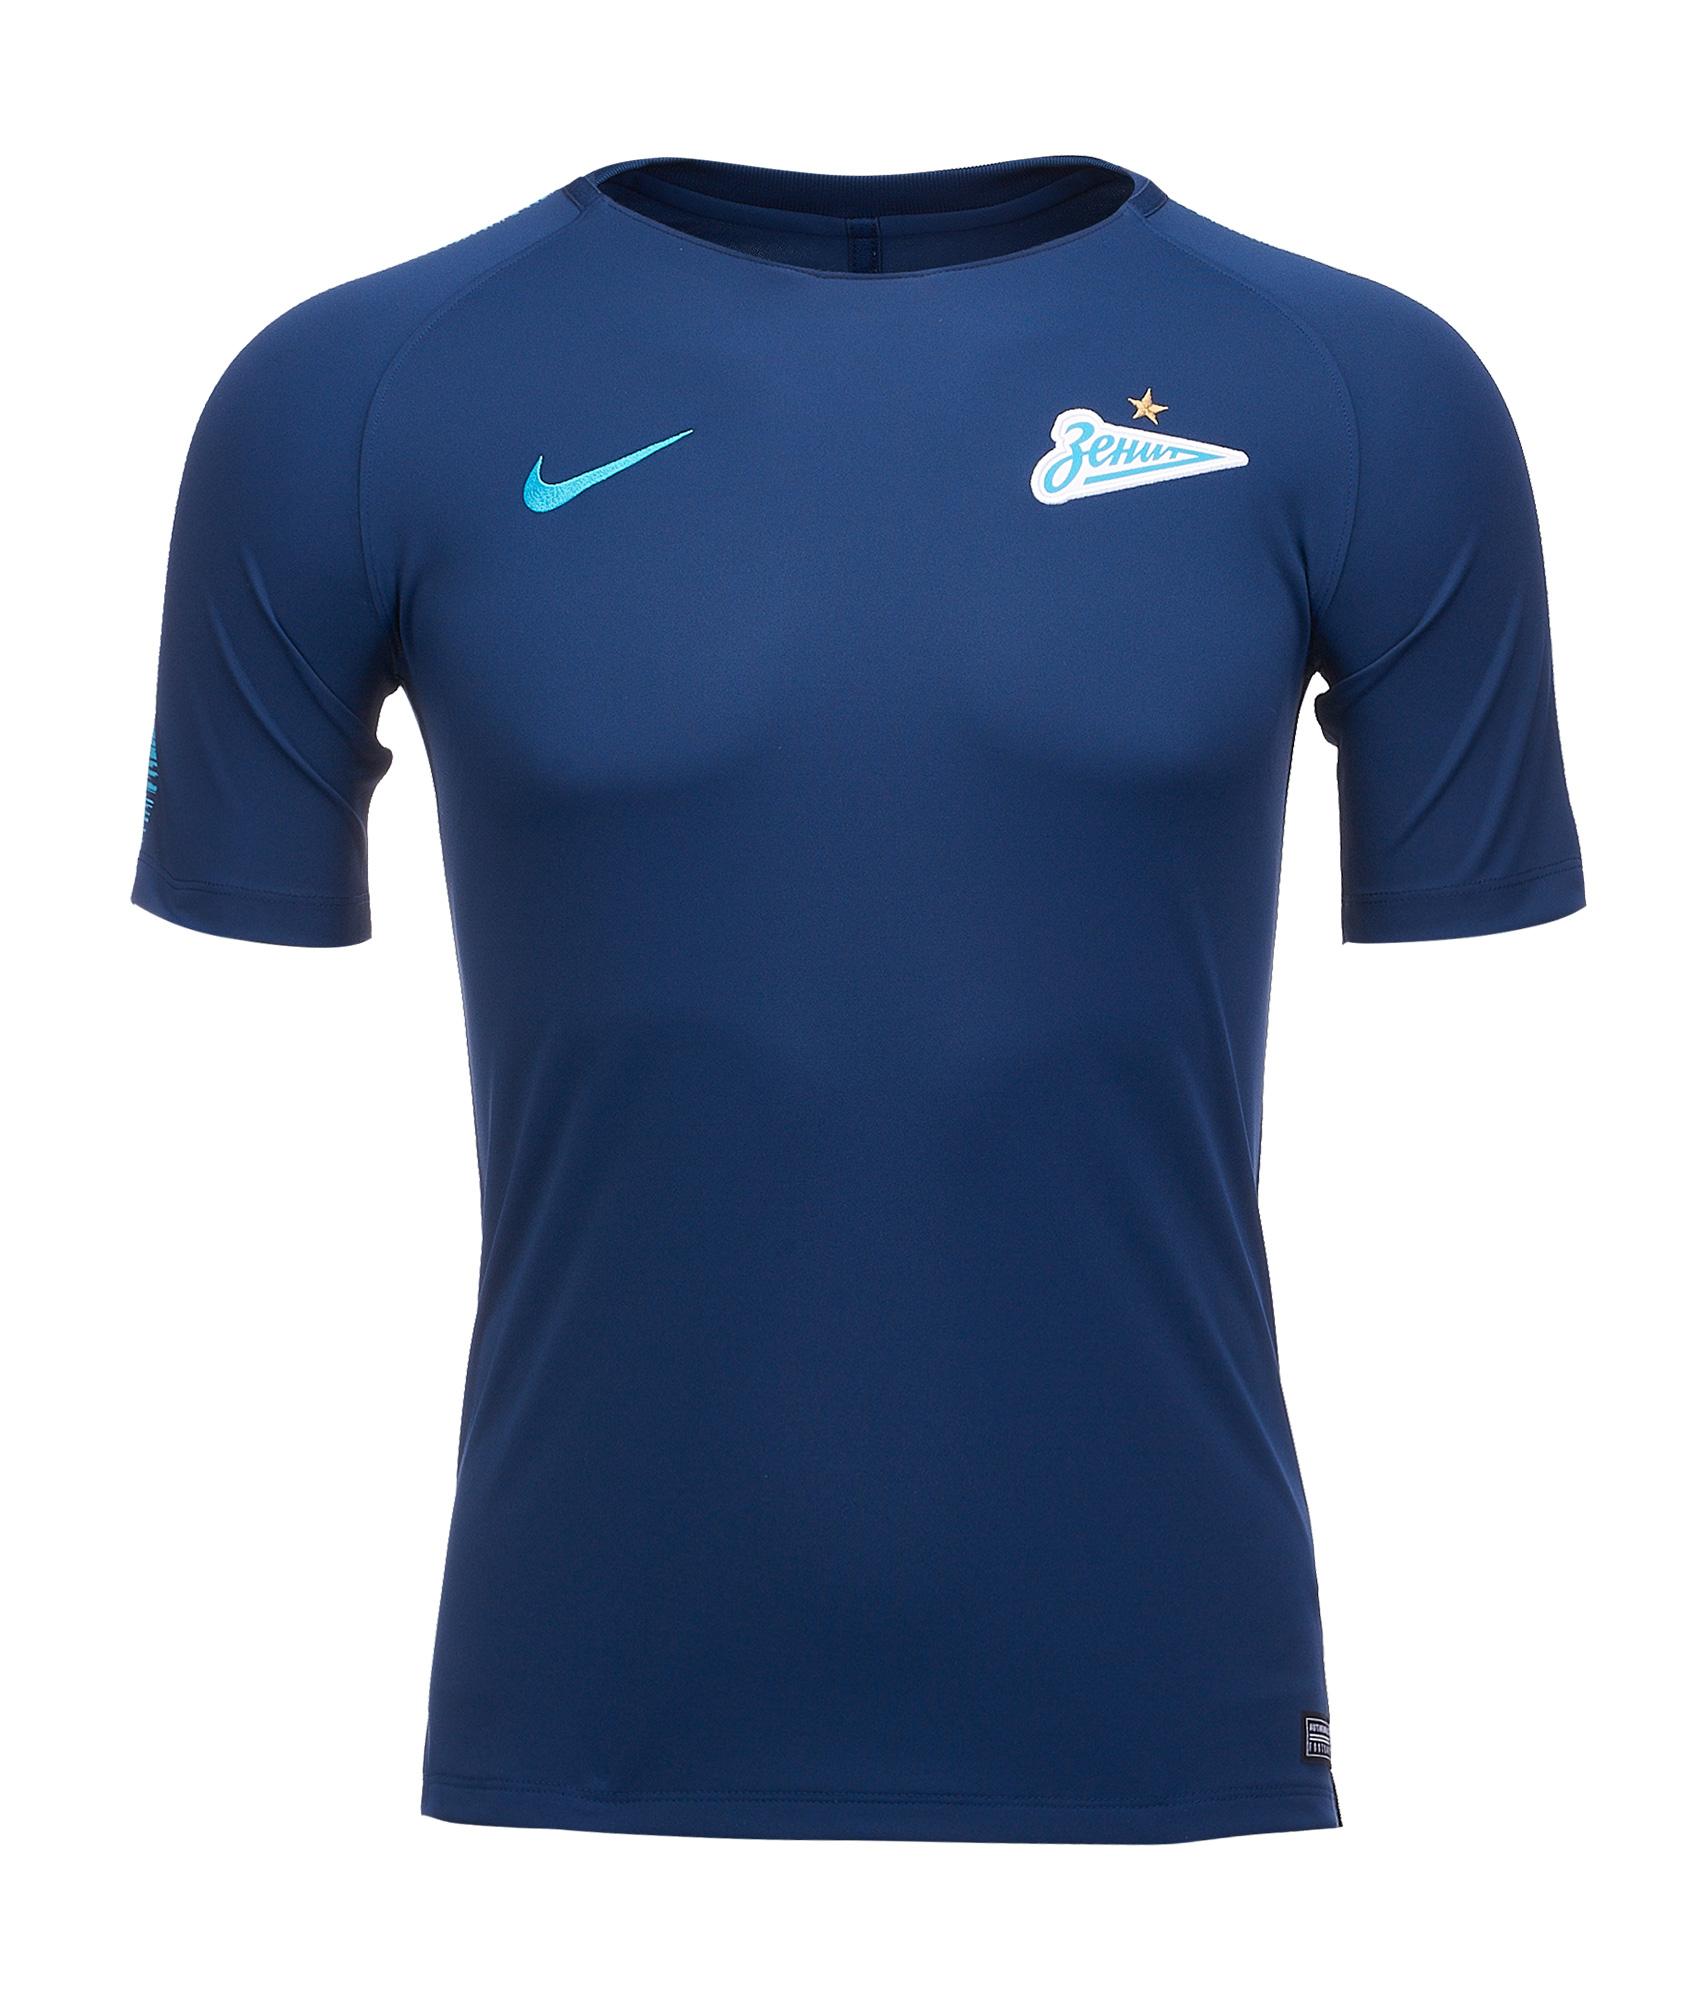 Футболка подростковая тренировочная Nike Zenit 2018/19 Nike шорты тренировочные подростковые nike zenit 2018 19 nike